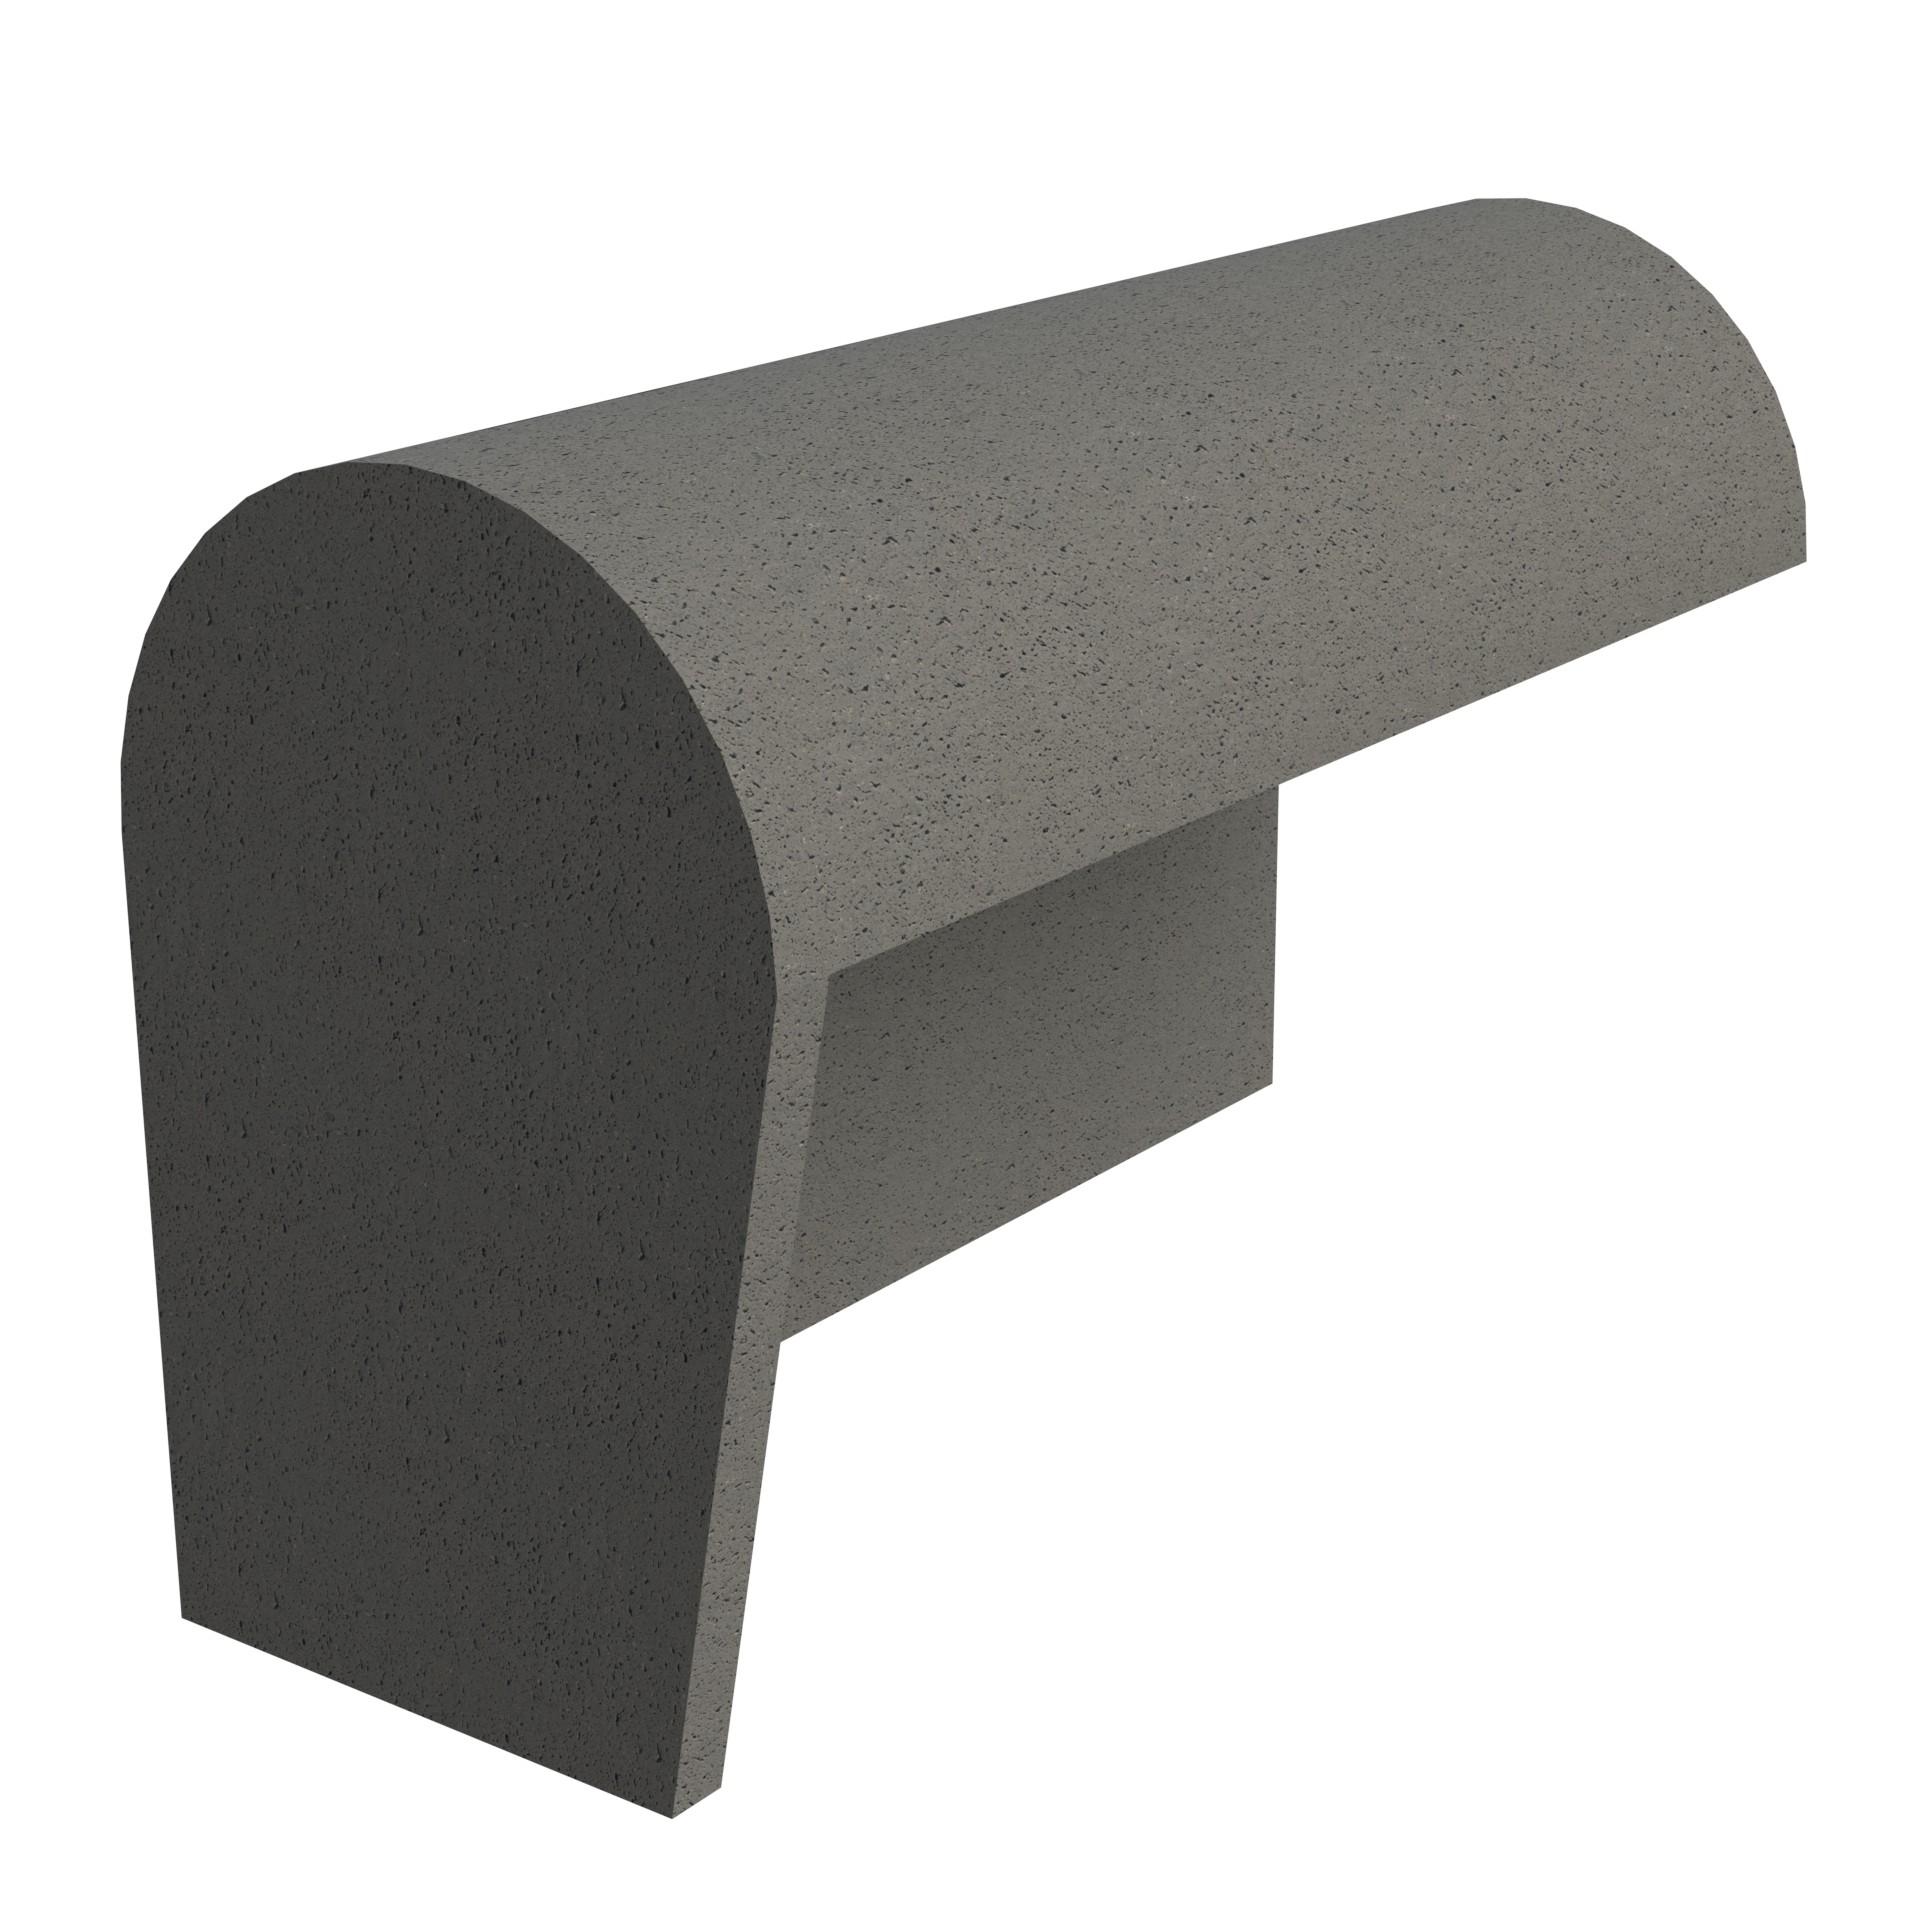 SANDTOFT TILES - Concrete Half Round Mono Ridge With Block End LH